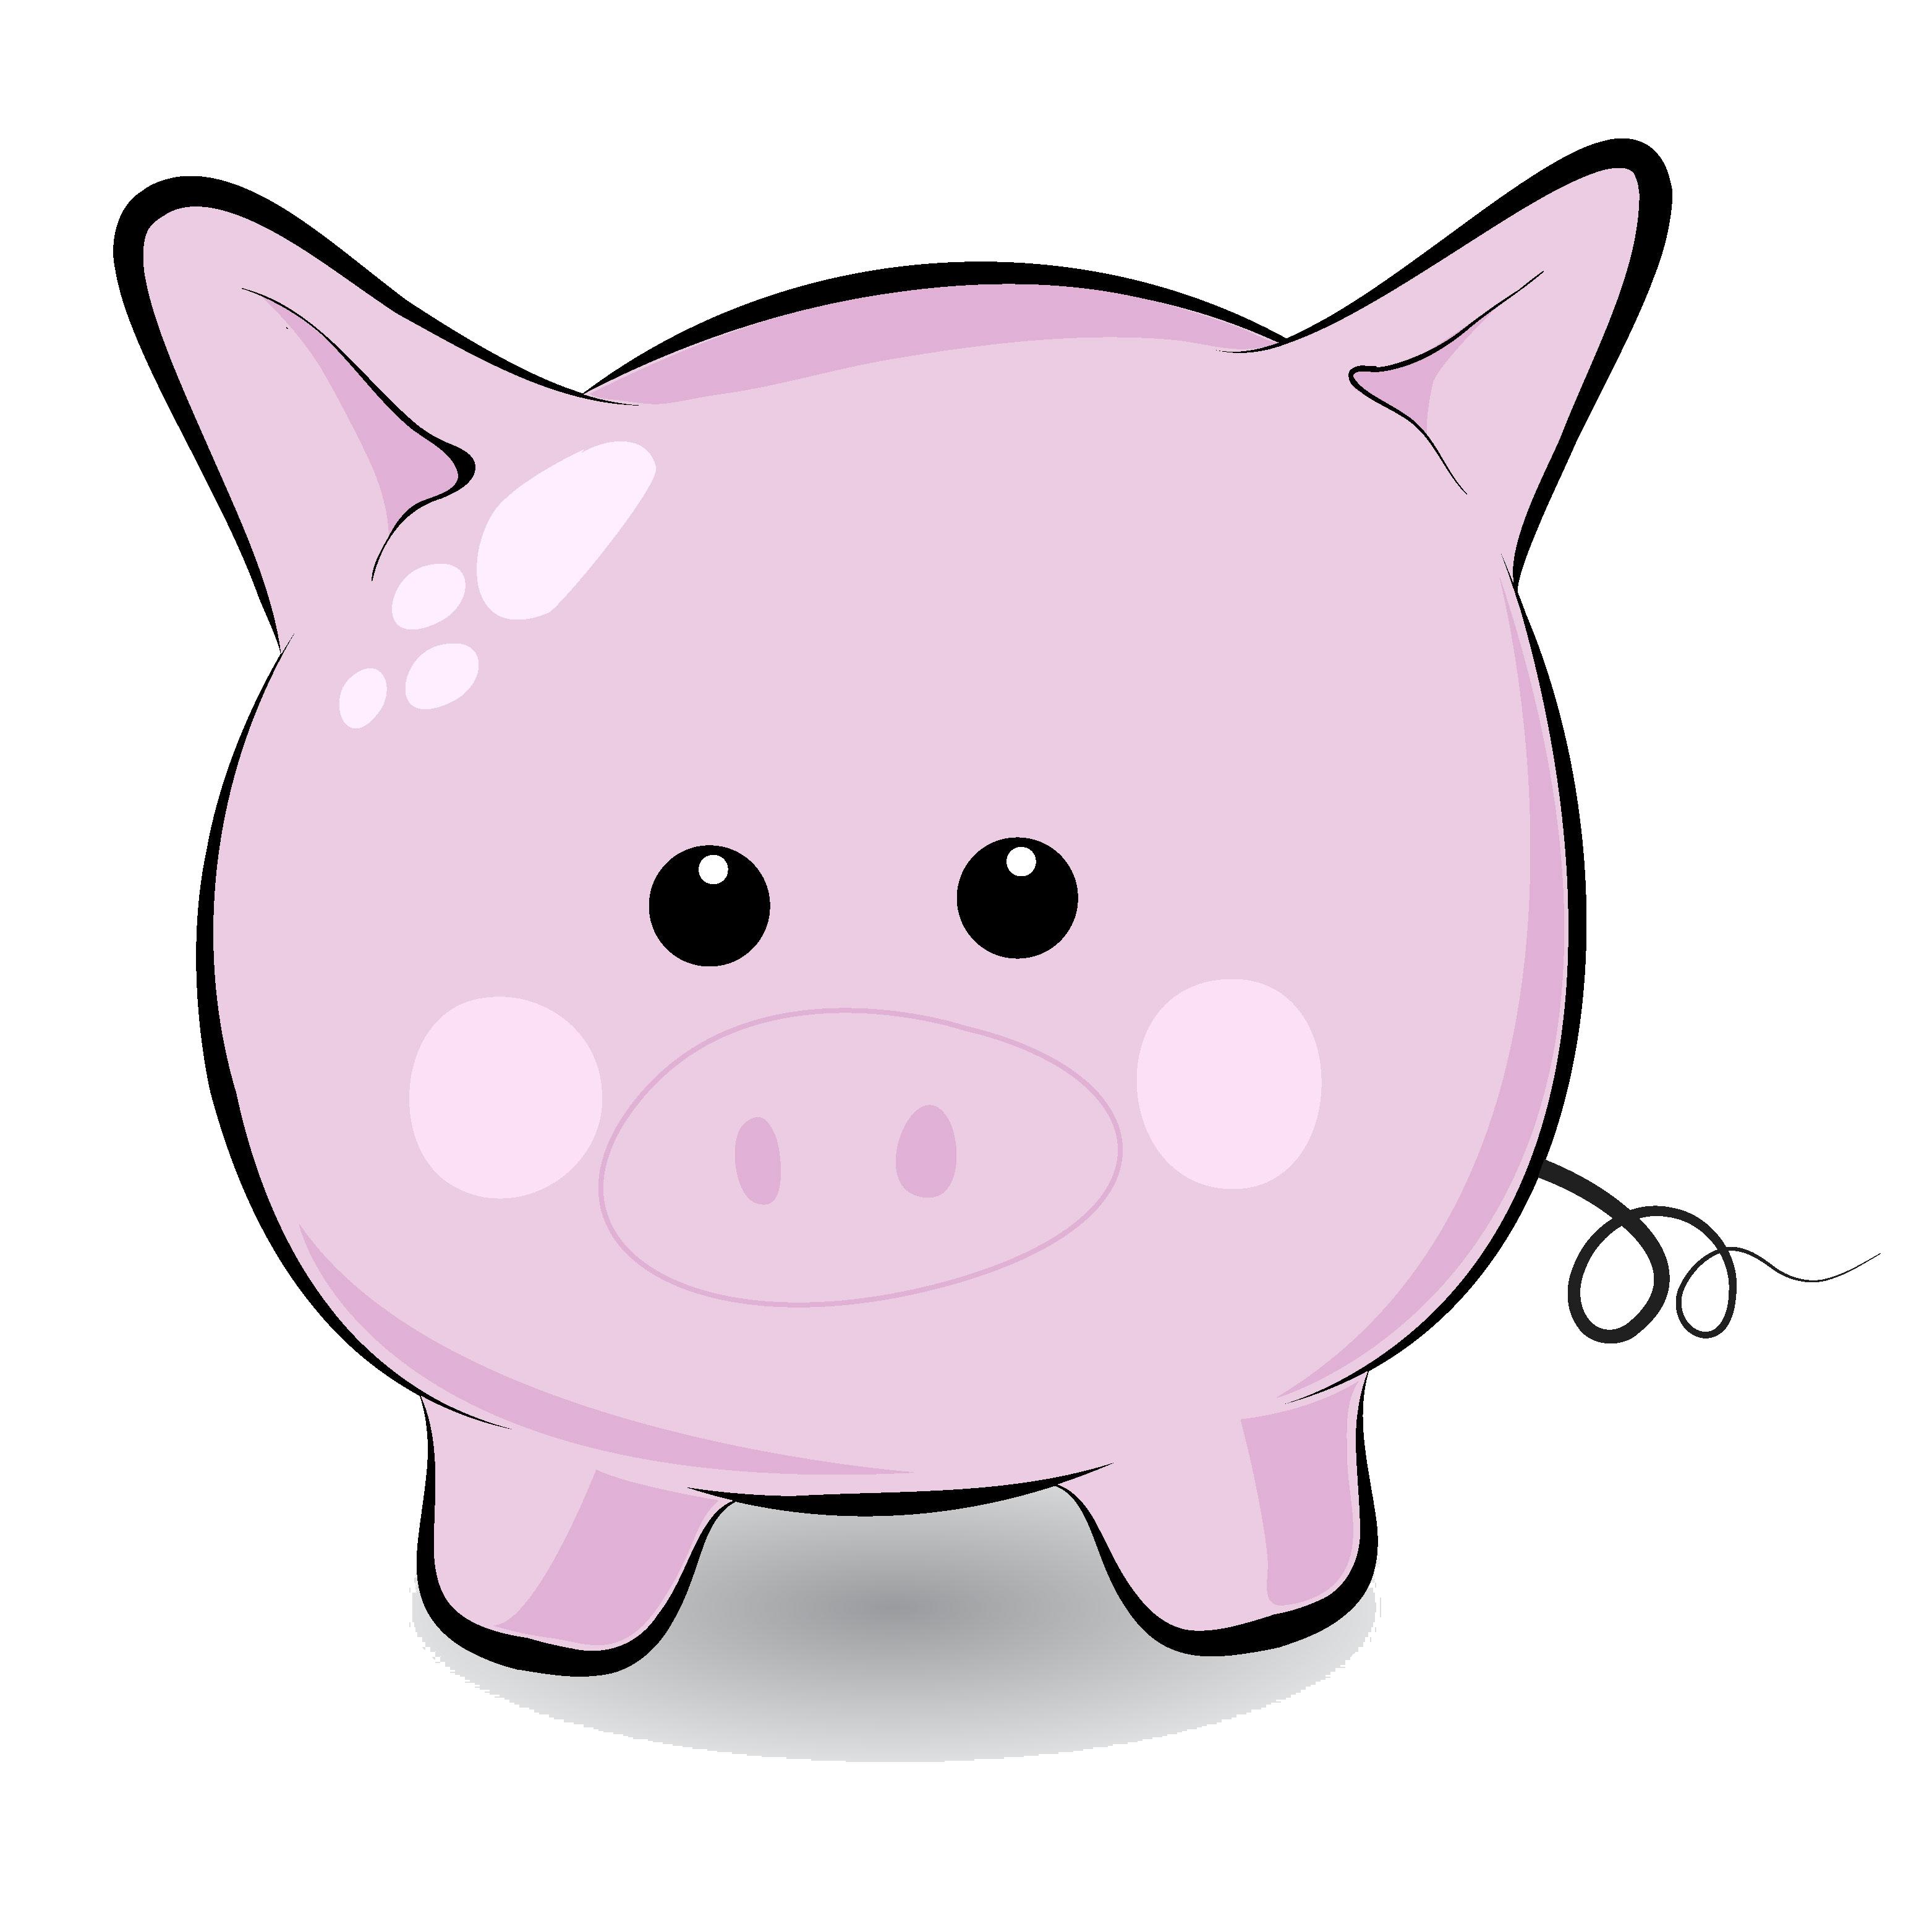 3125x3125 Free Pig Clipart